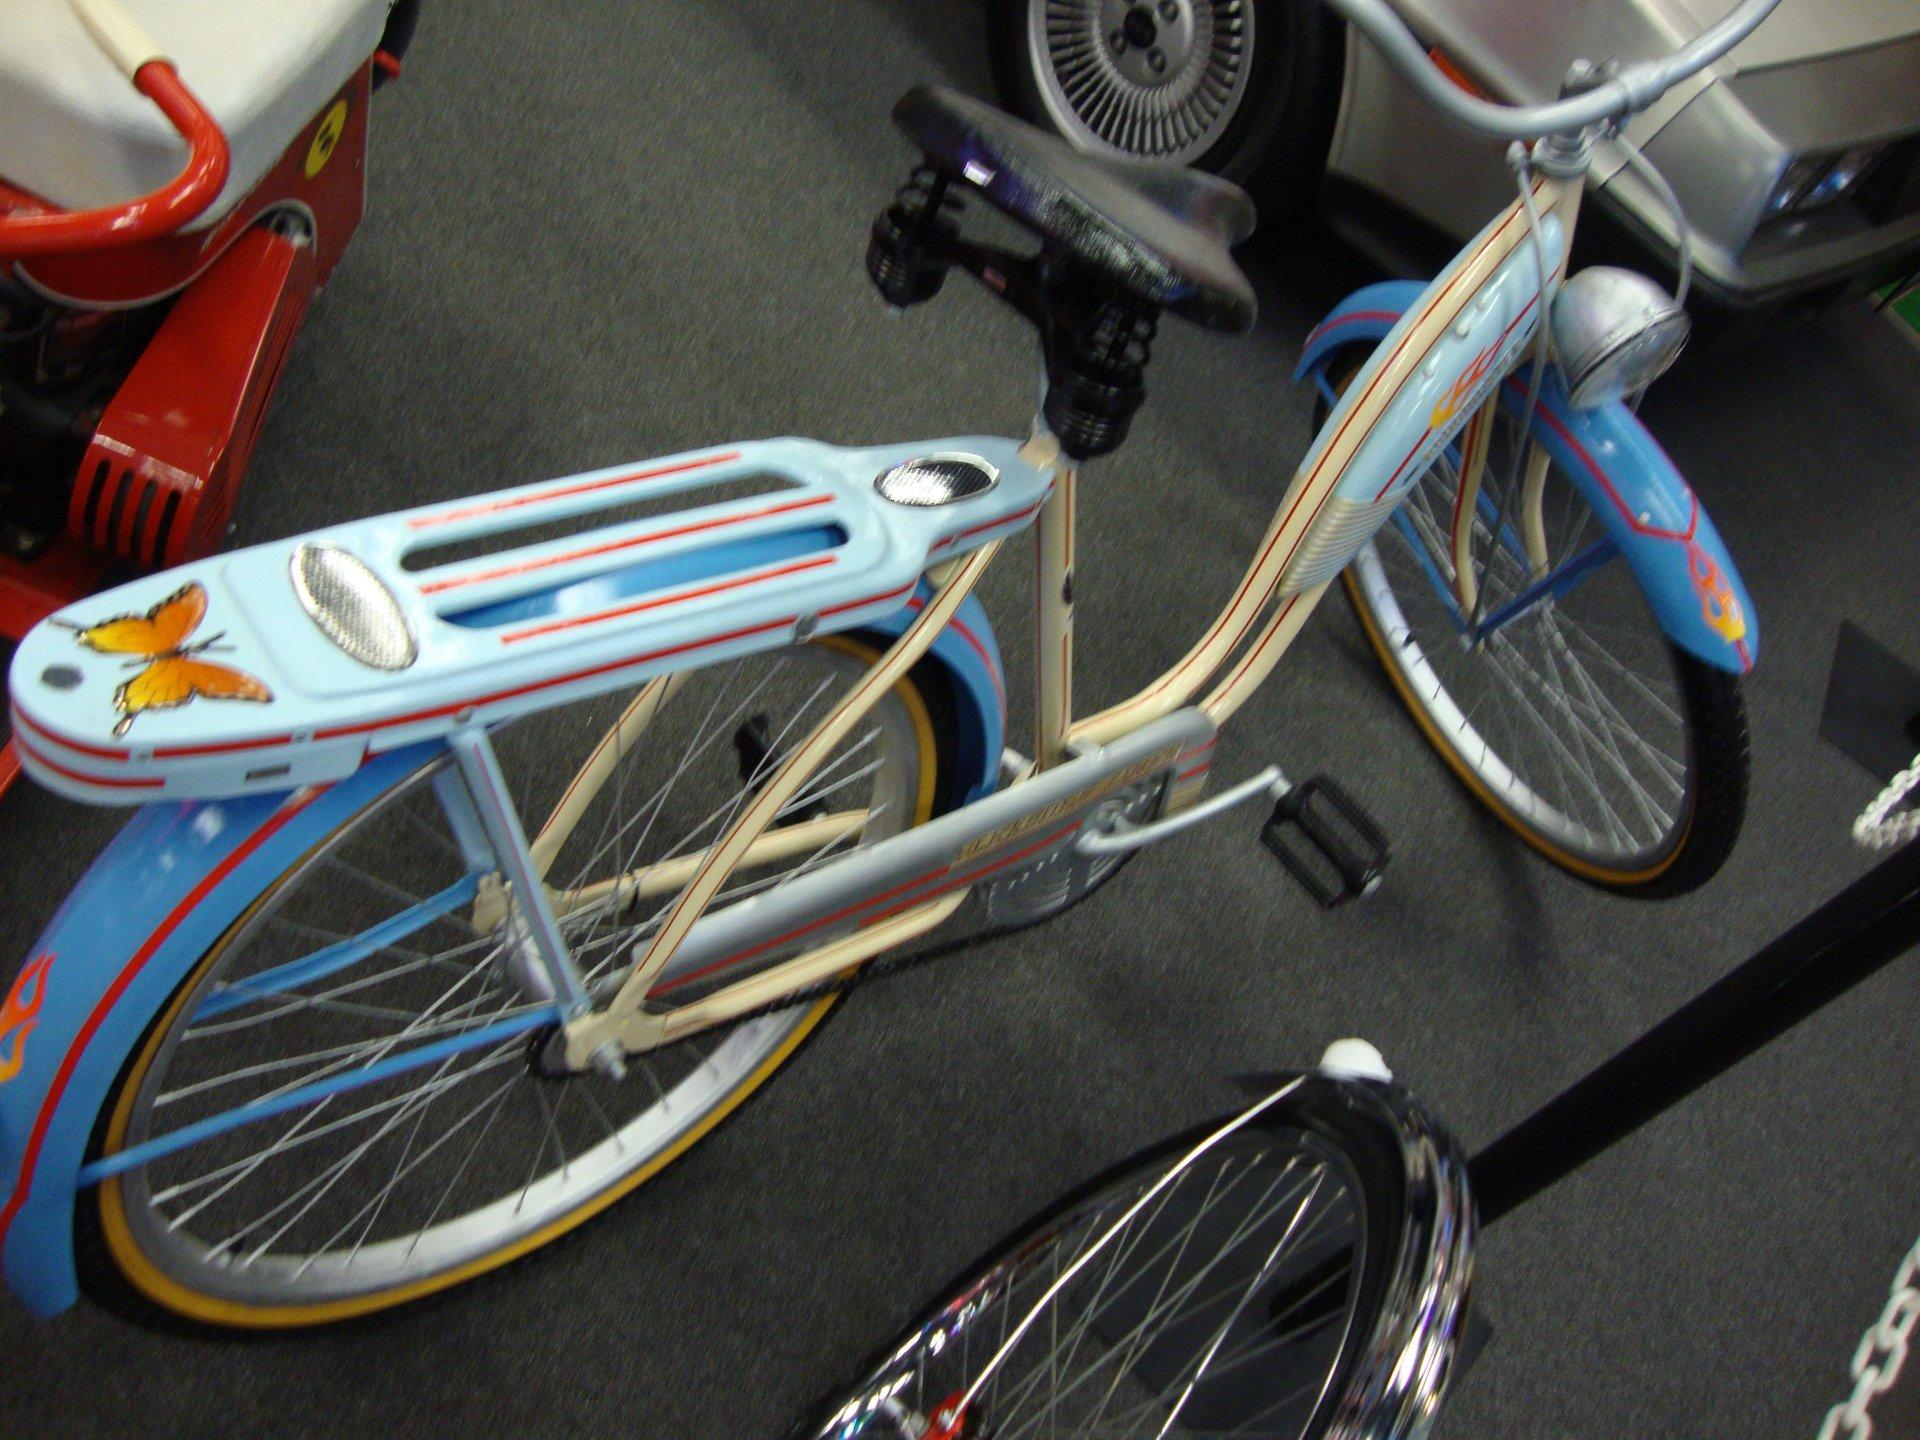 Roadmaster pleasure cycle